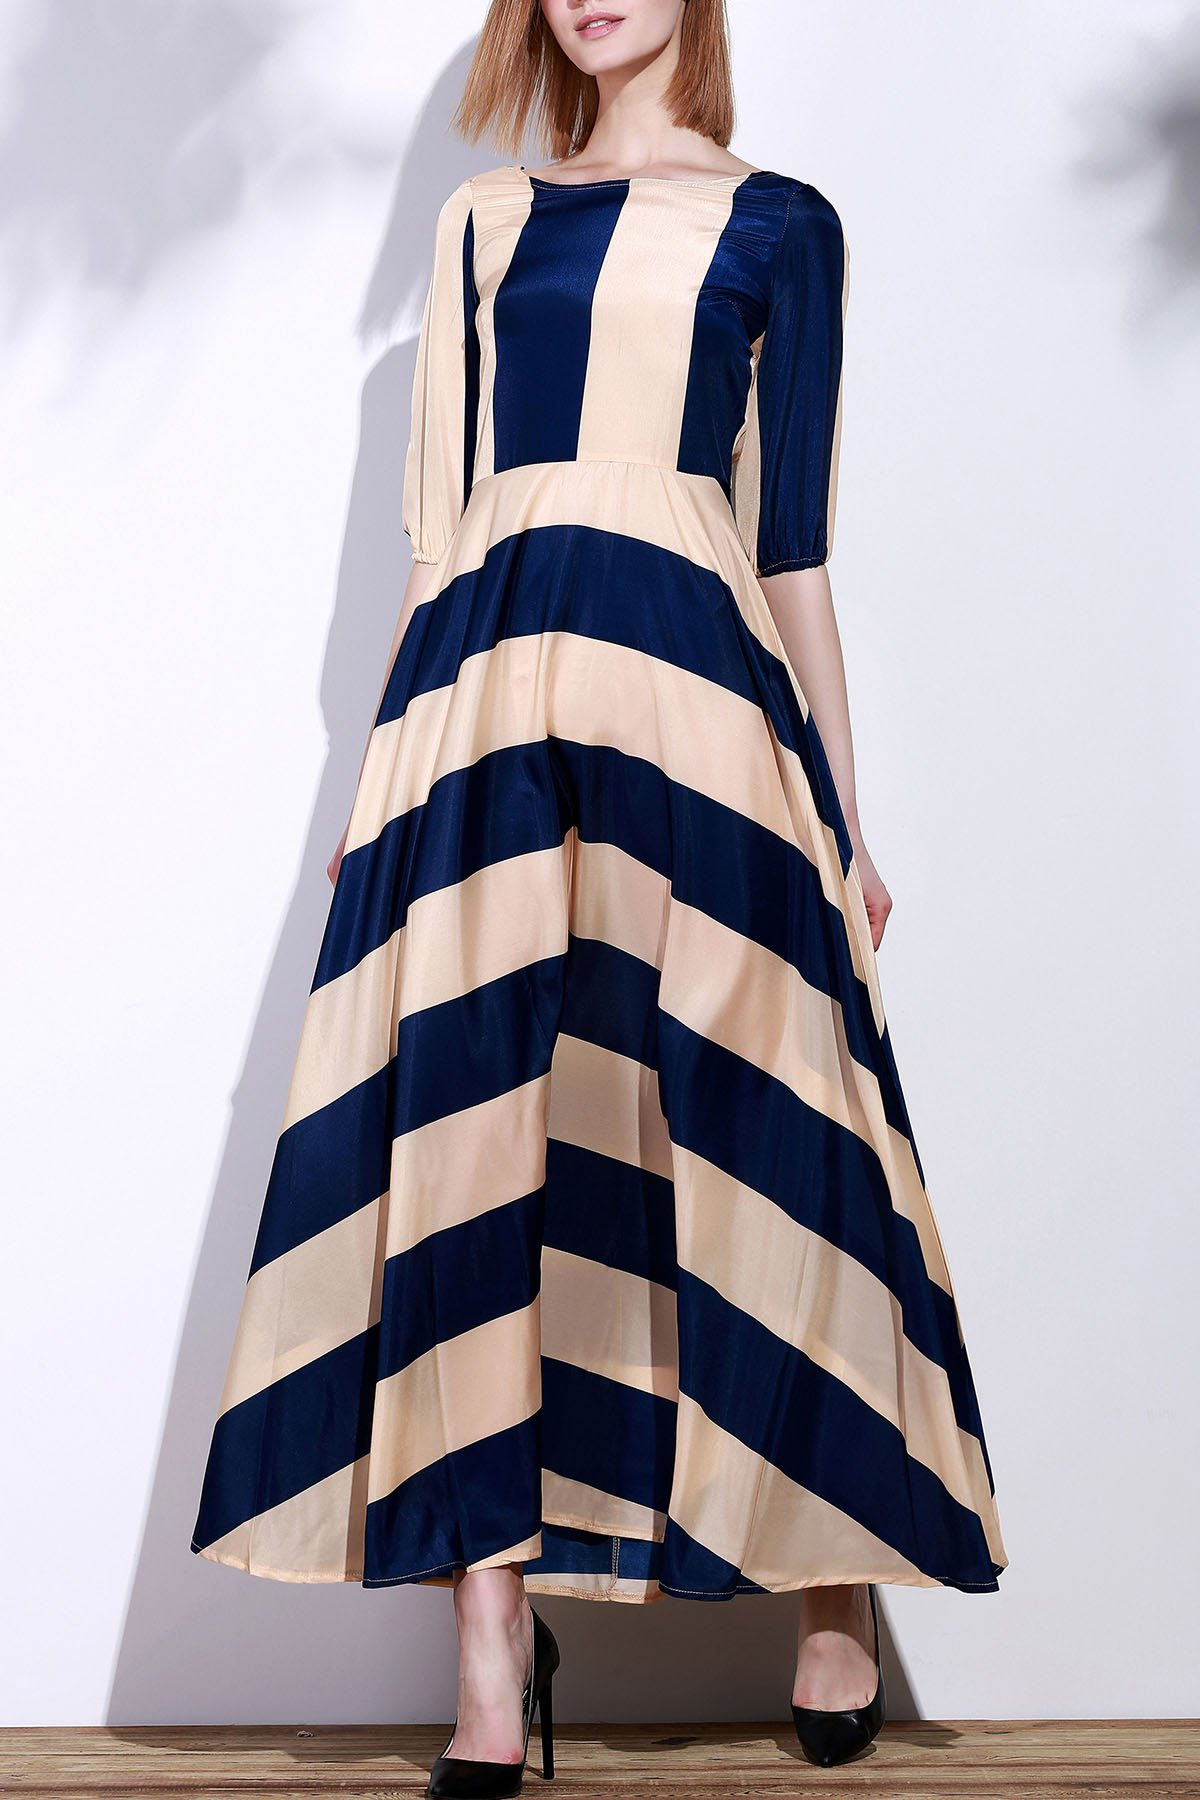 Striped Scoop Neck 3/4 Sleeve Maxi Dress - DEEP BLUE S